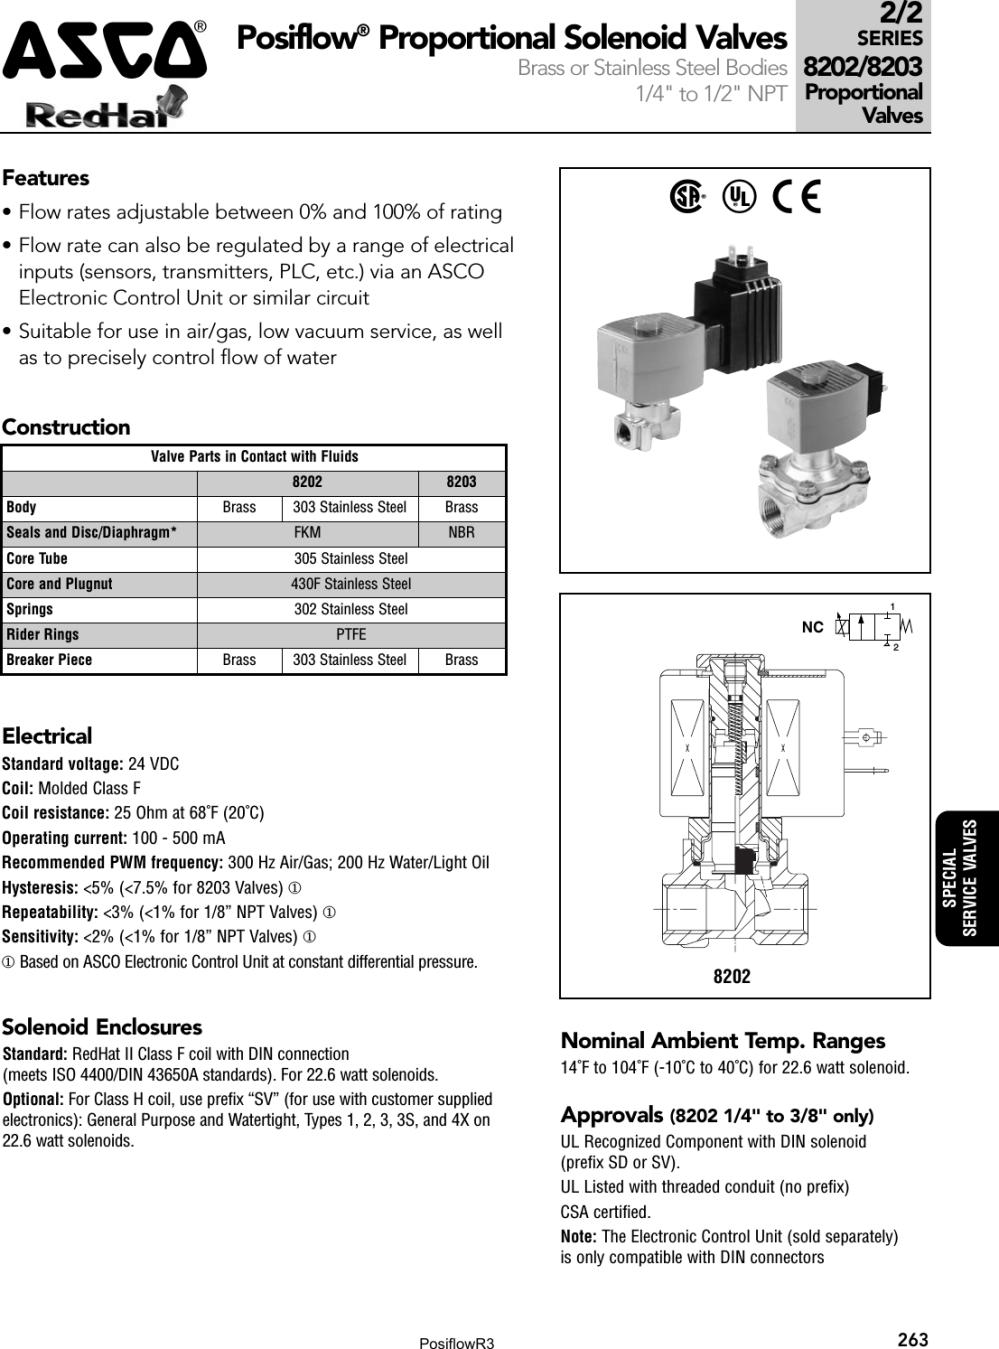 medium resolution of  flow asco posiflow 1505492470 posiflowr3 user manual asco din connector wiring diagram on